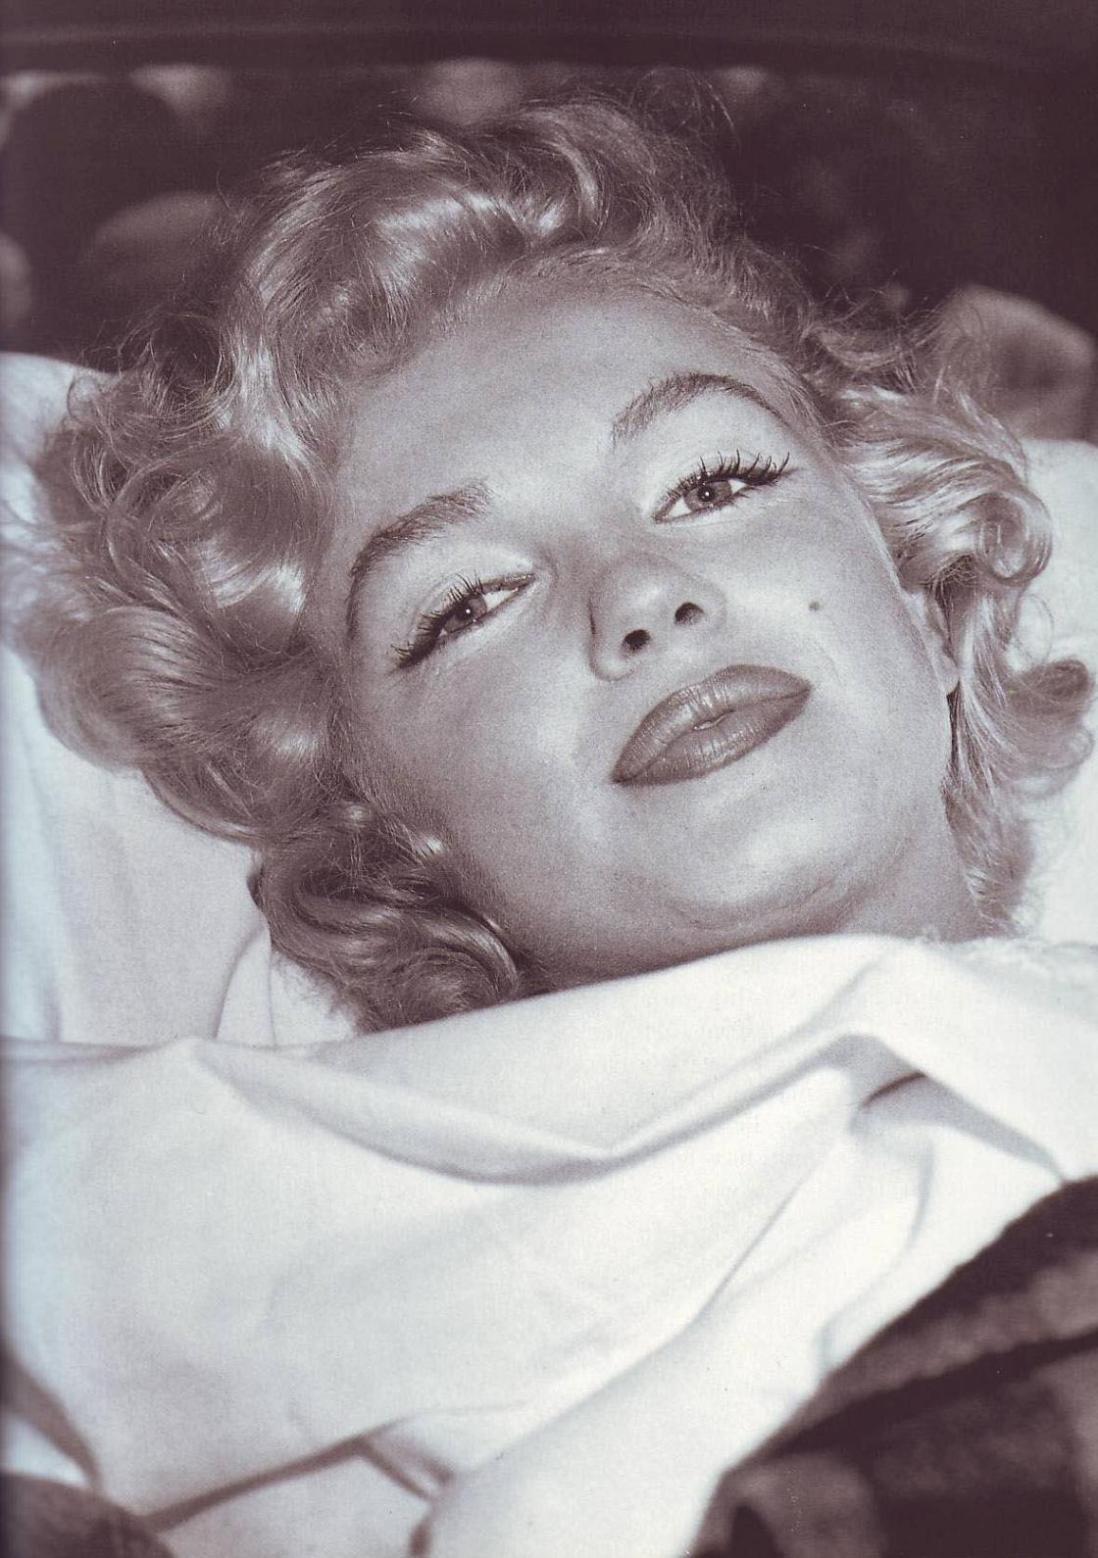 Danamos Marilyn Monroe Pages Autopsy Autopsy photo of marilyn monroe